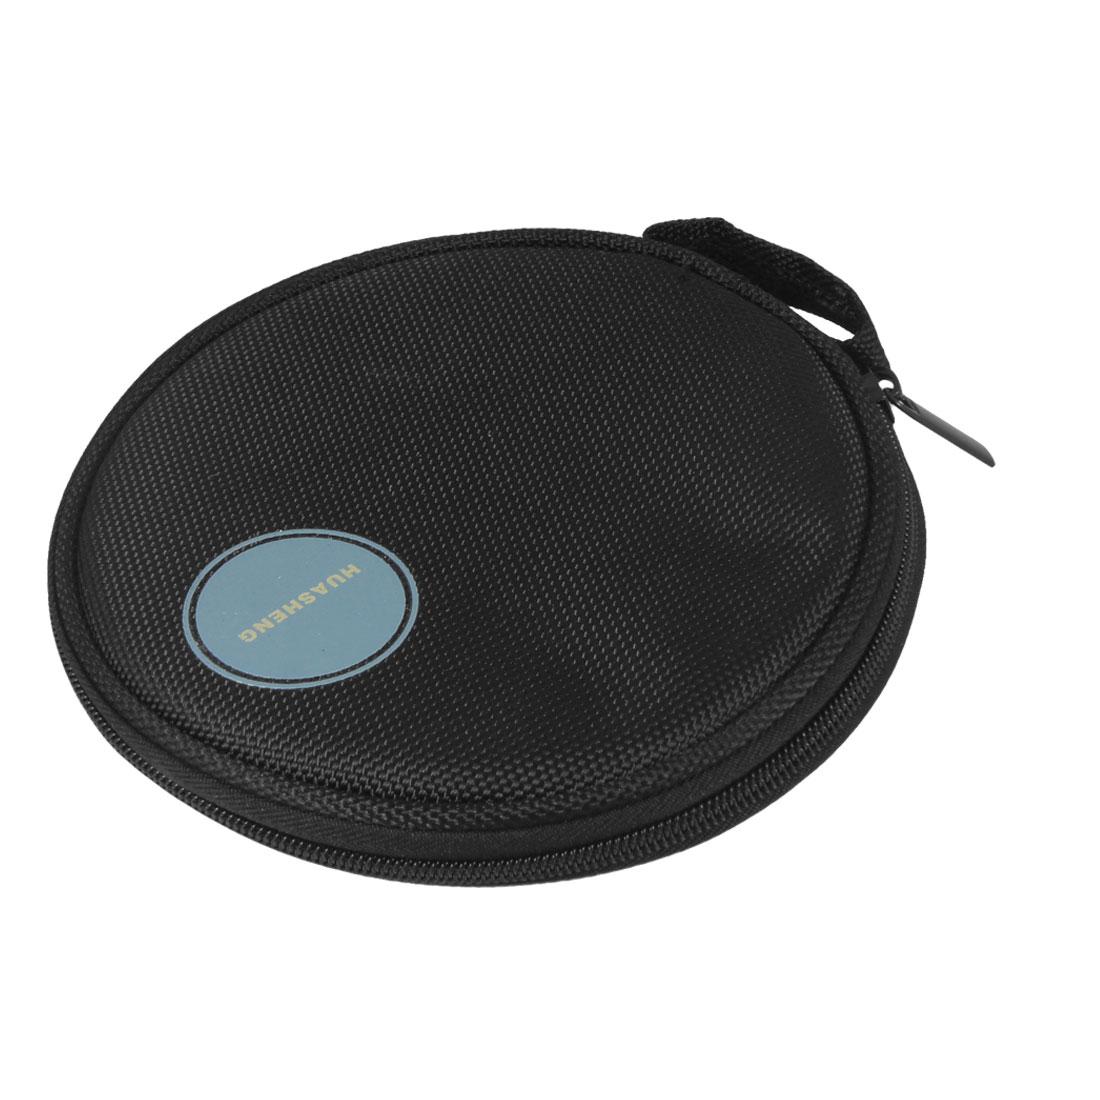 Black Nylon 10 Sheets 20 Pieces Capacity Auto Car CD DVD Round Case Bag Holder